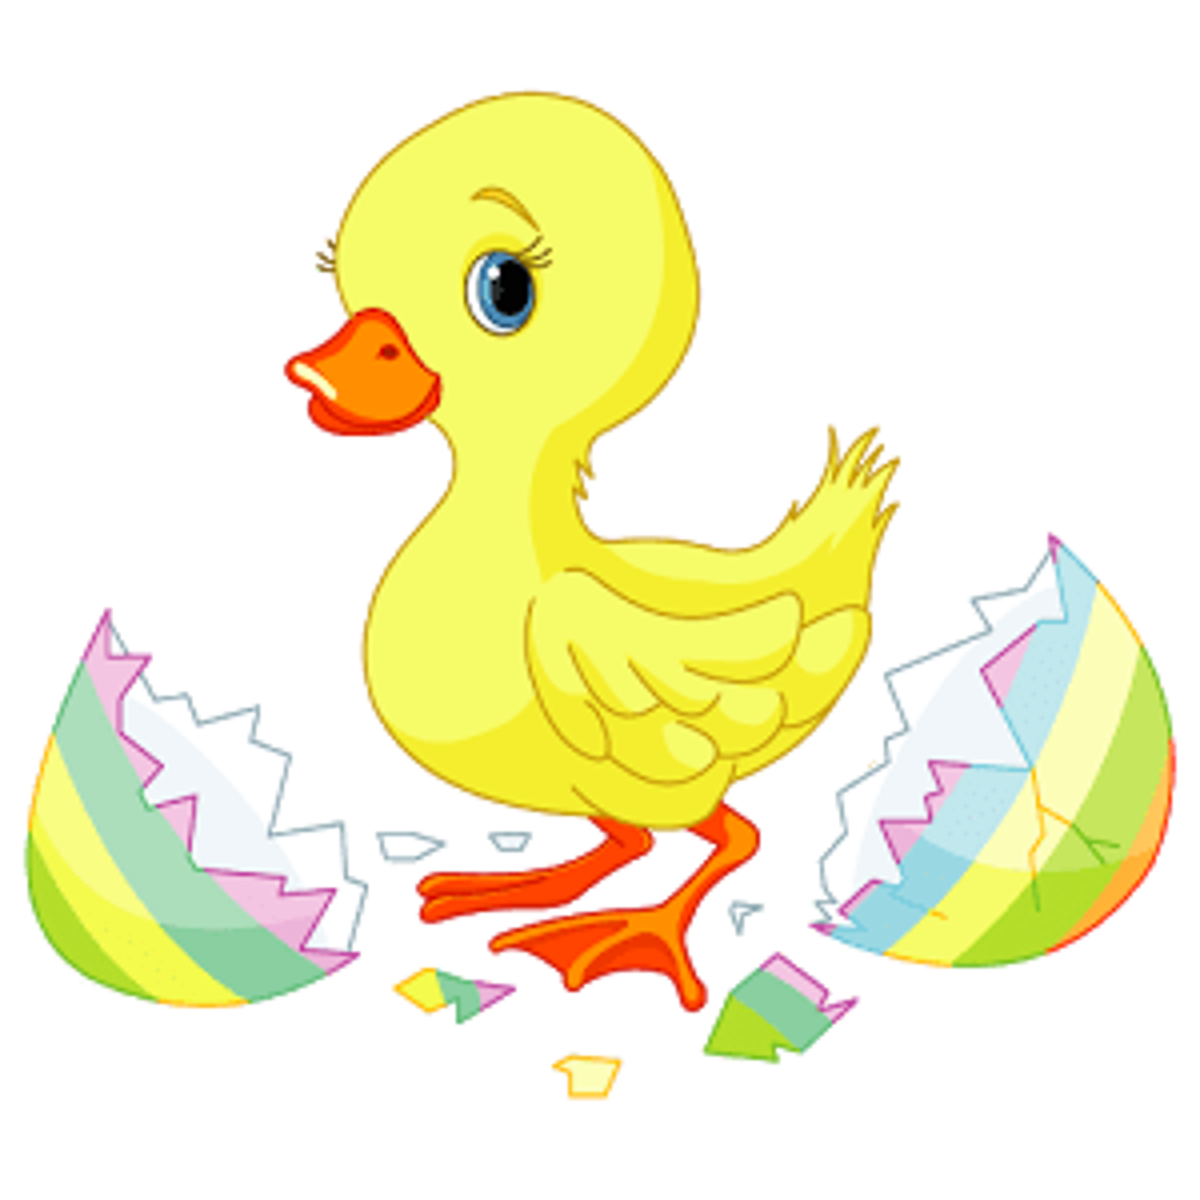 Juegos de Pascua 2